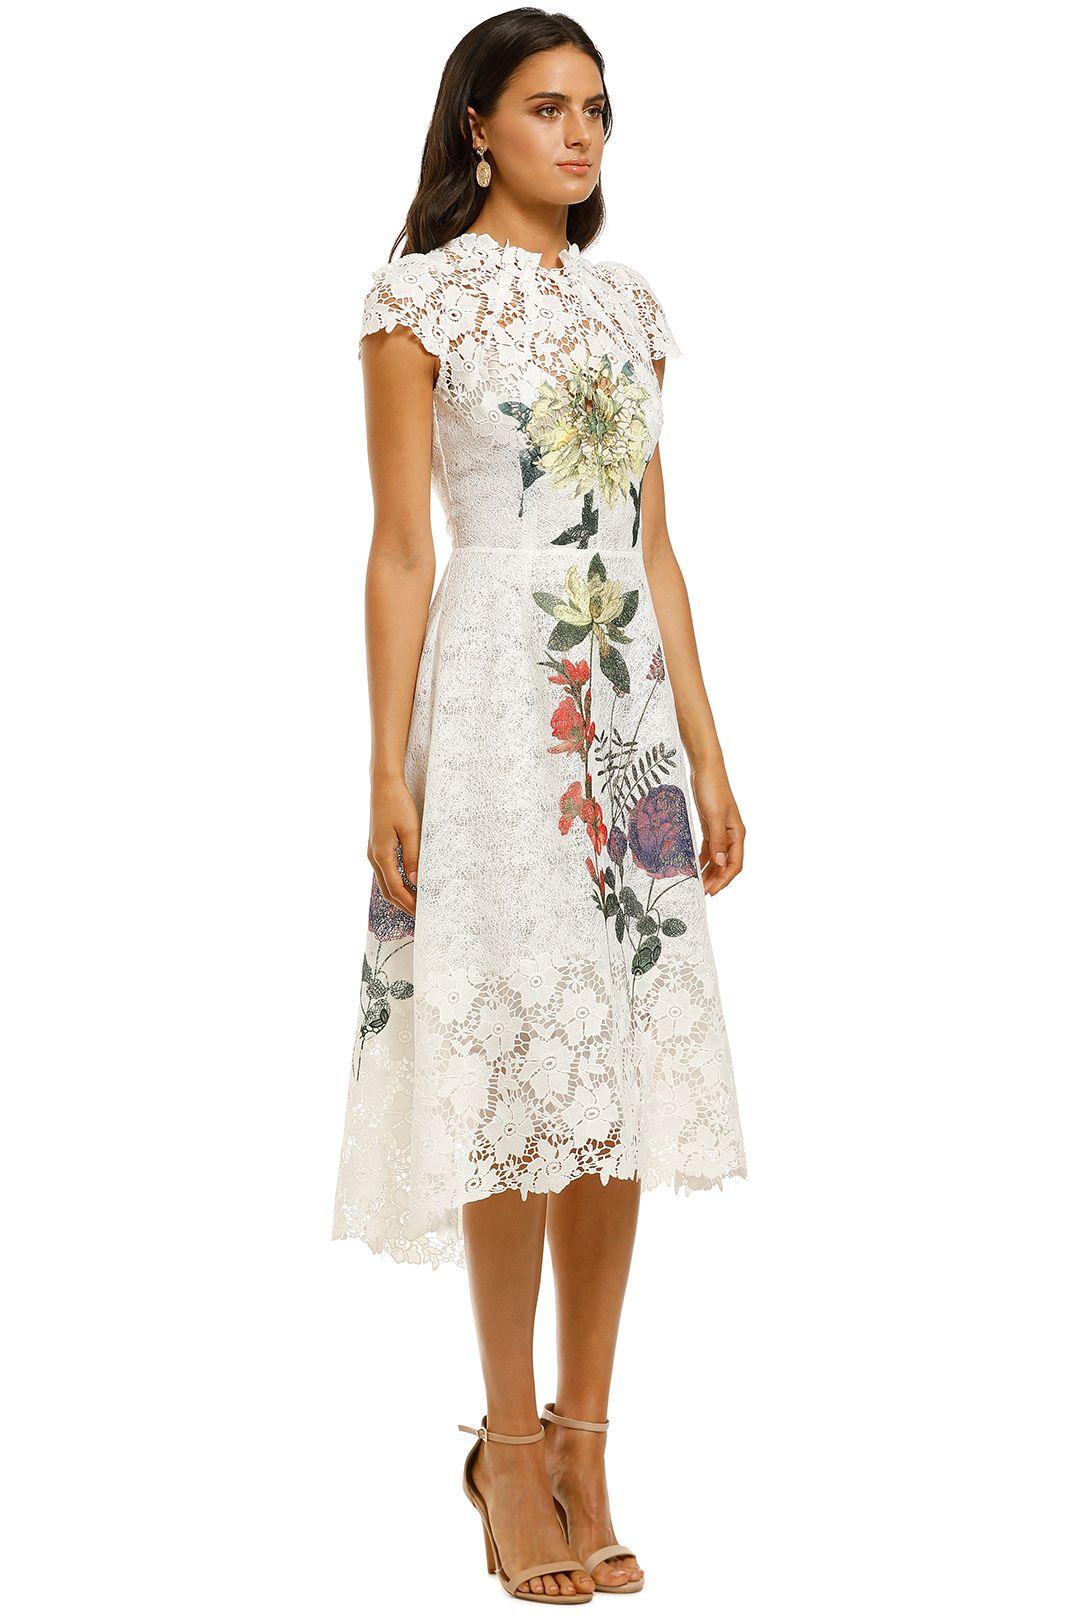 Moos-and-Spy-Fleur-Dress-White-Side